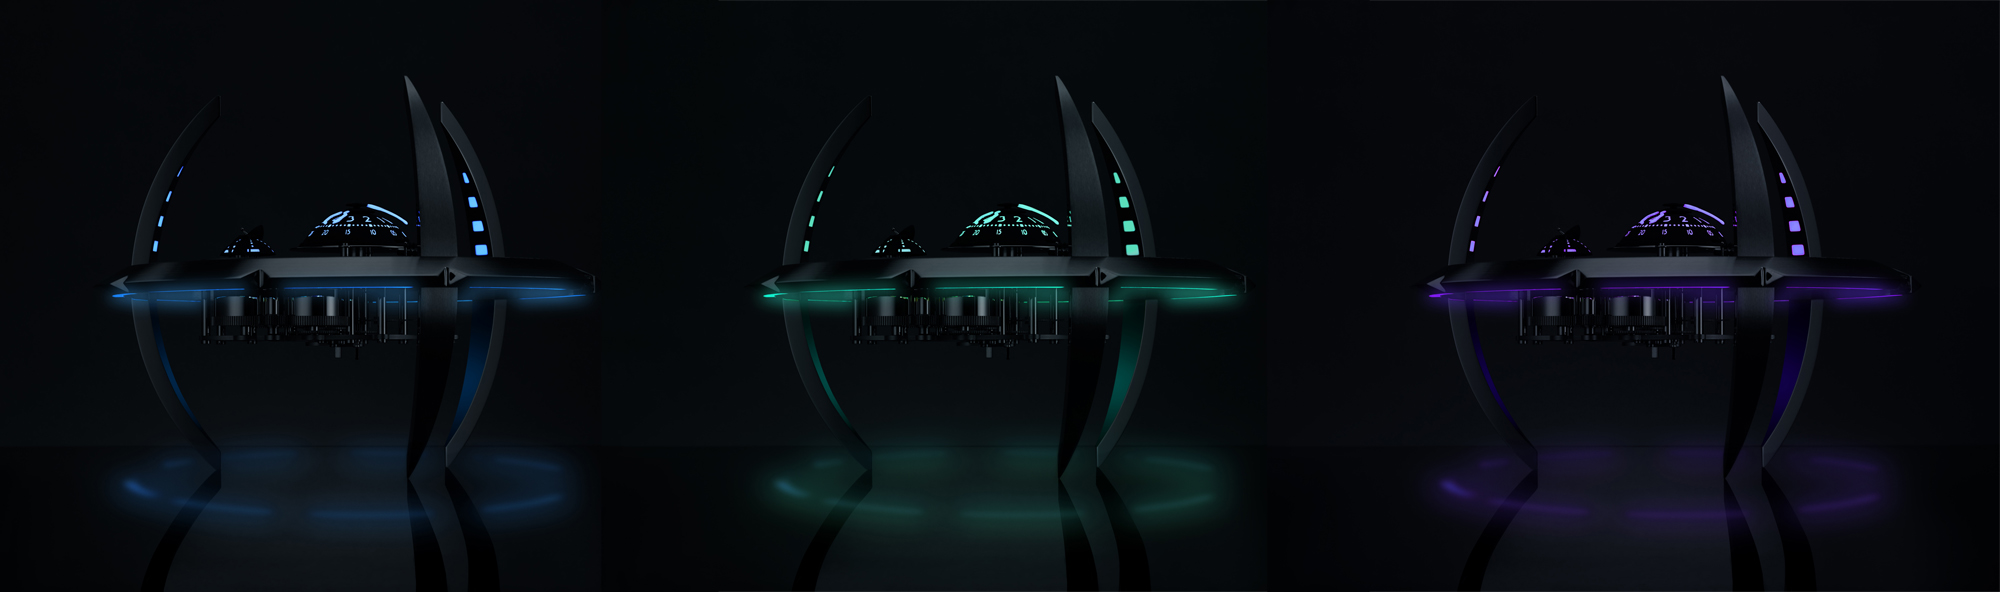 MB&F Starfleet Machine Black Badger - 3 couleurs